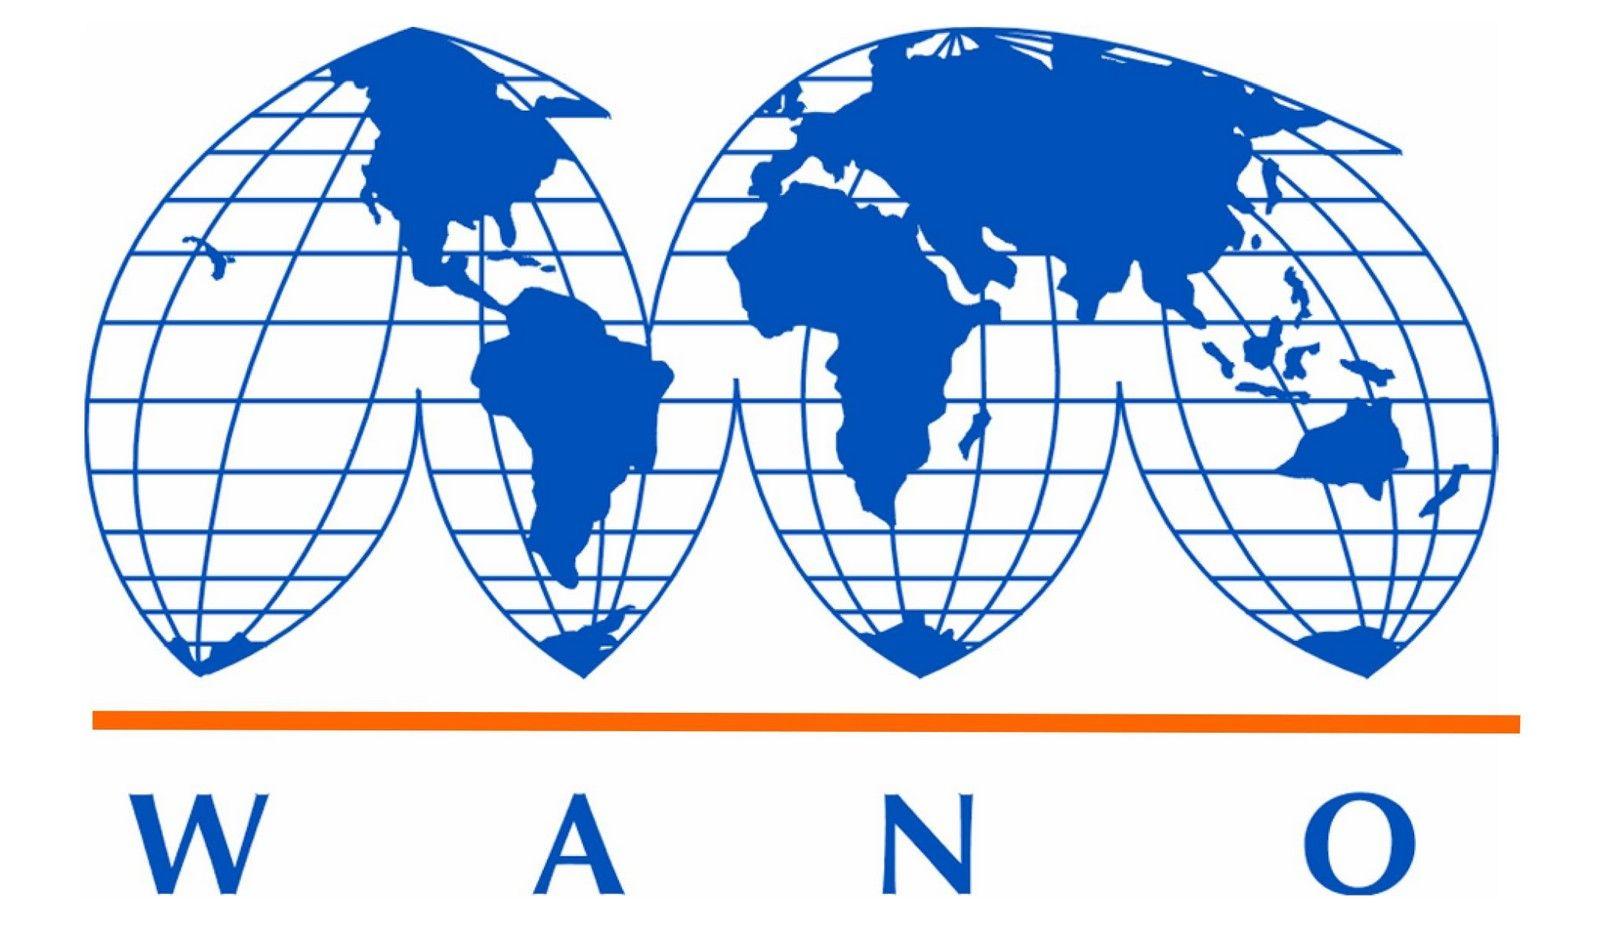 WANO Logo World Association of Nuclear Operators